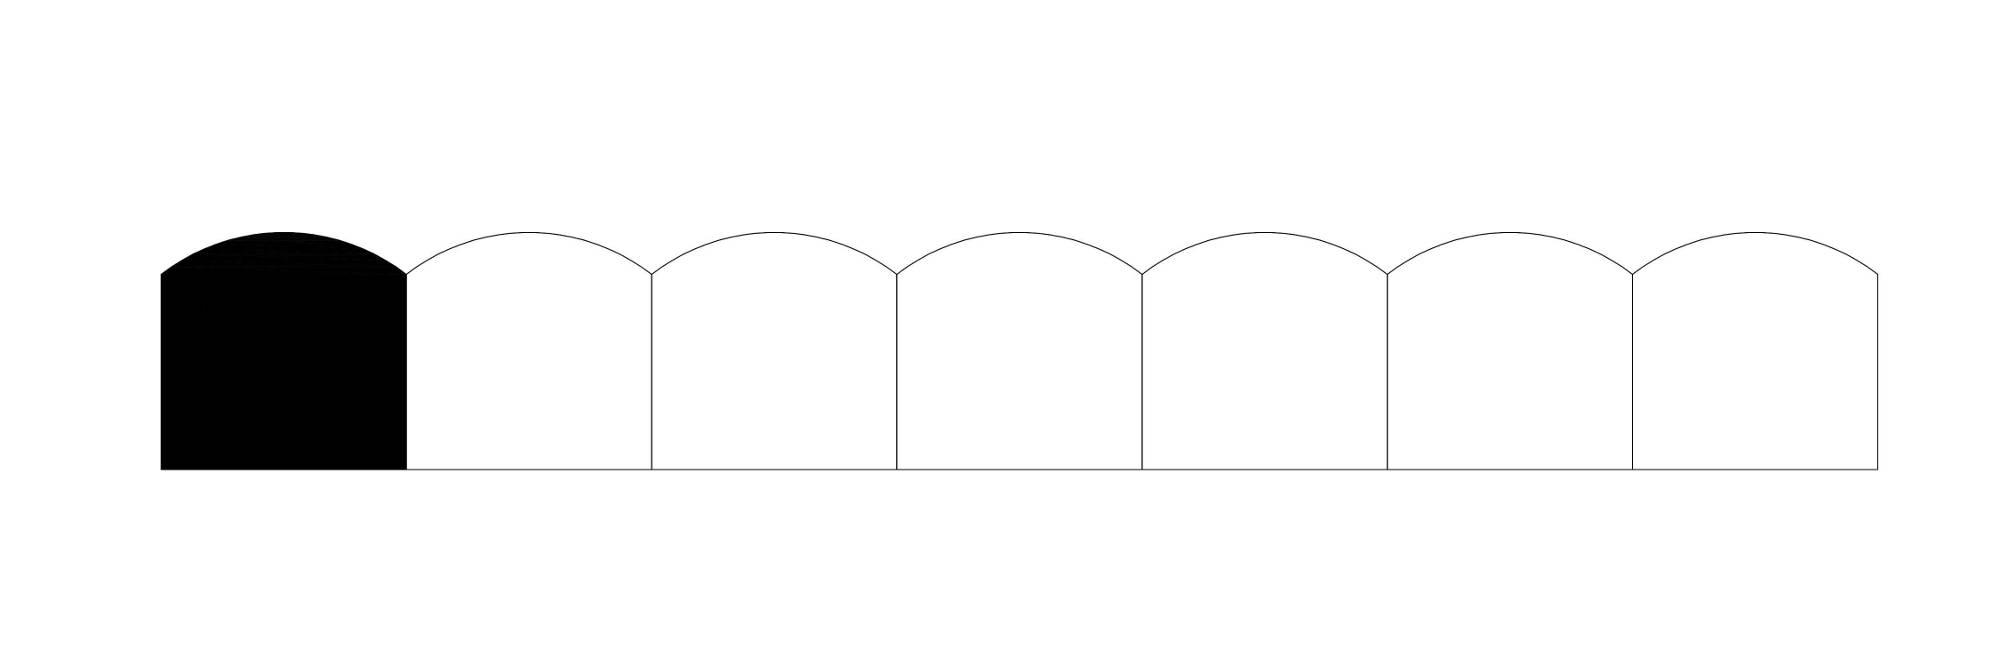 GAISS-arhitekti-MADE-Railway-Museum-web2 (10)-crop